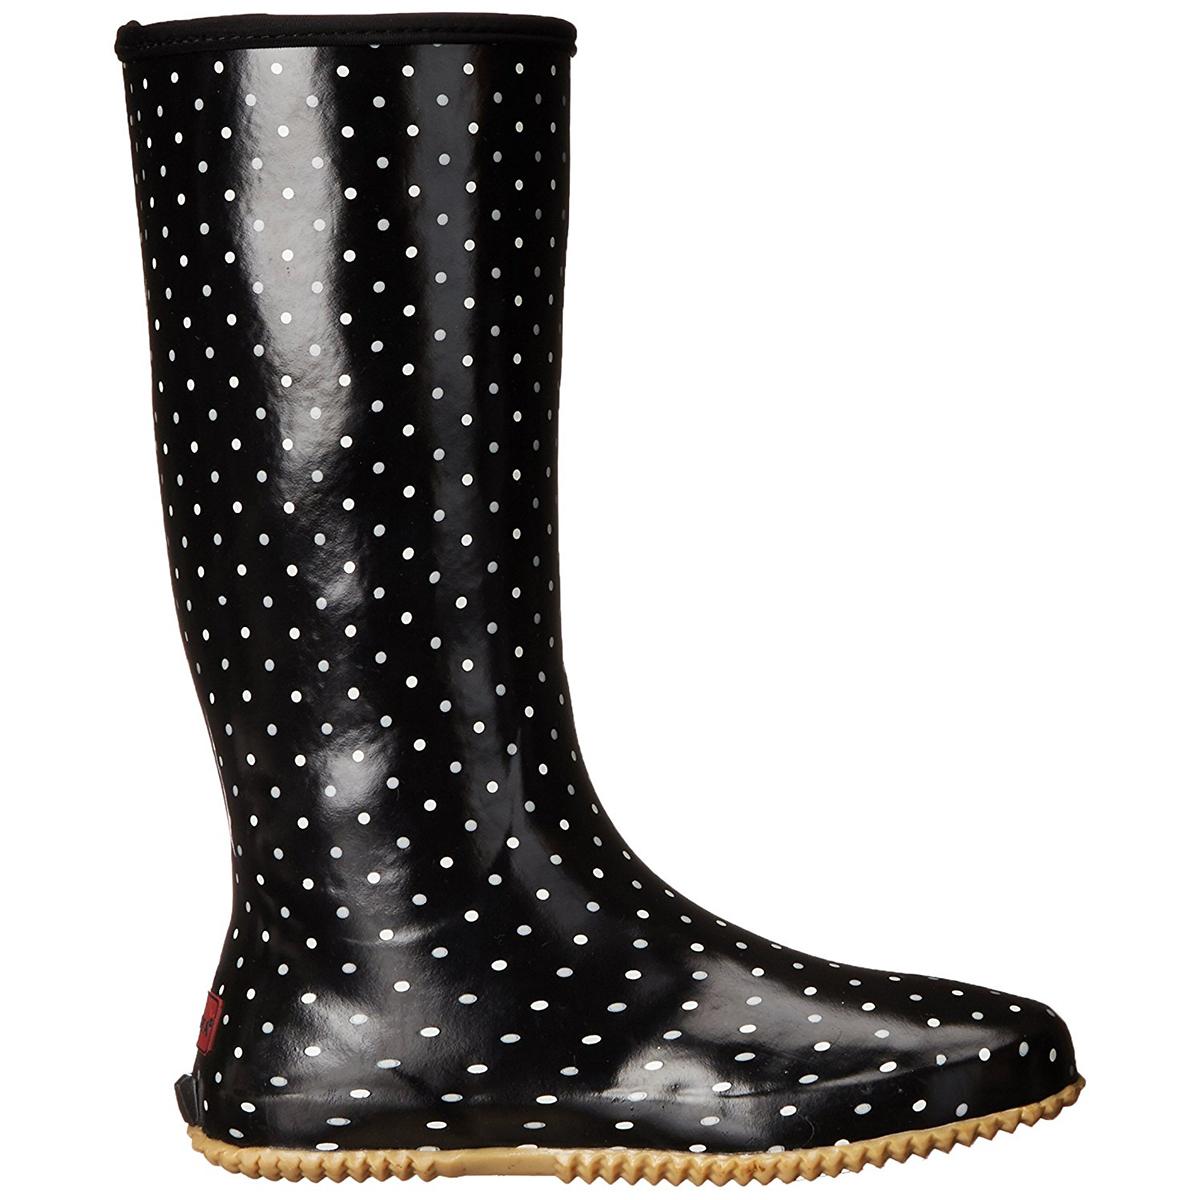 Chooka-Women-039-s-Rubber-Rain-Boots-Mid-Calf-With-Lightweight-Packable-Travel-Bag thumbnail 19